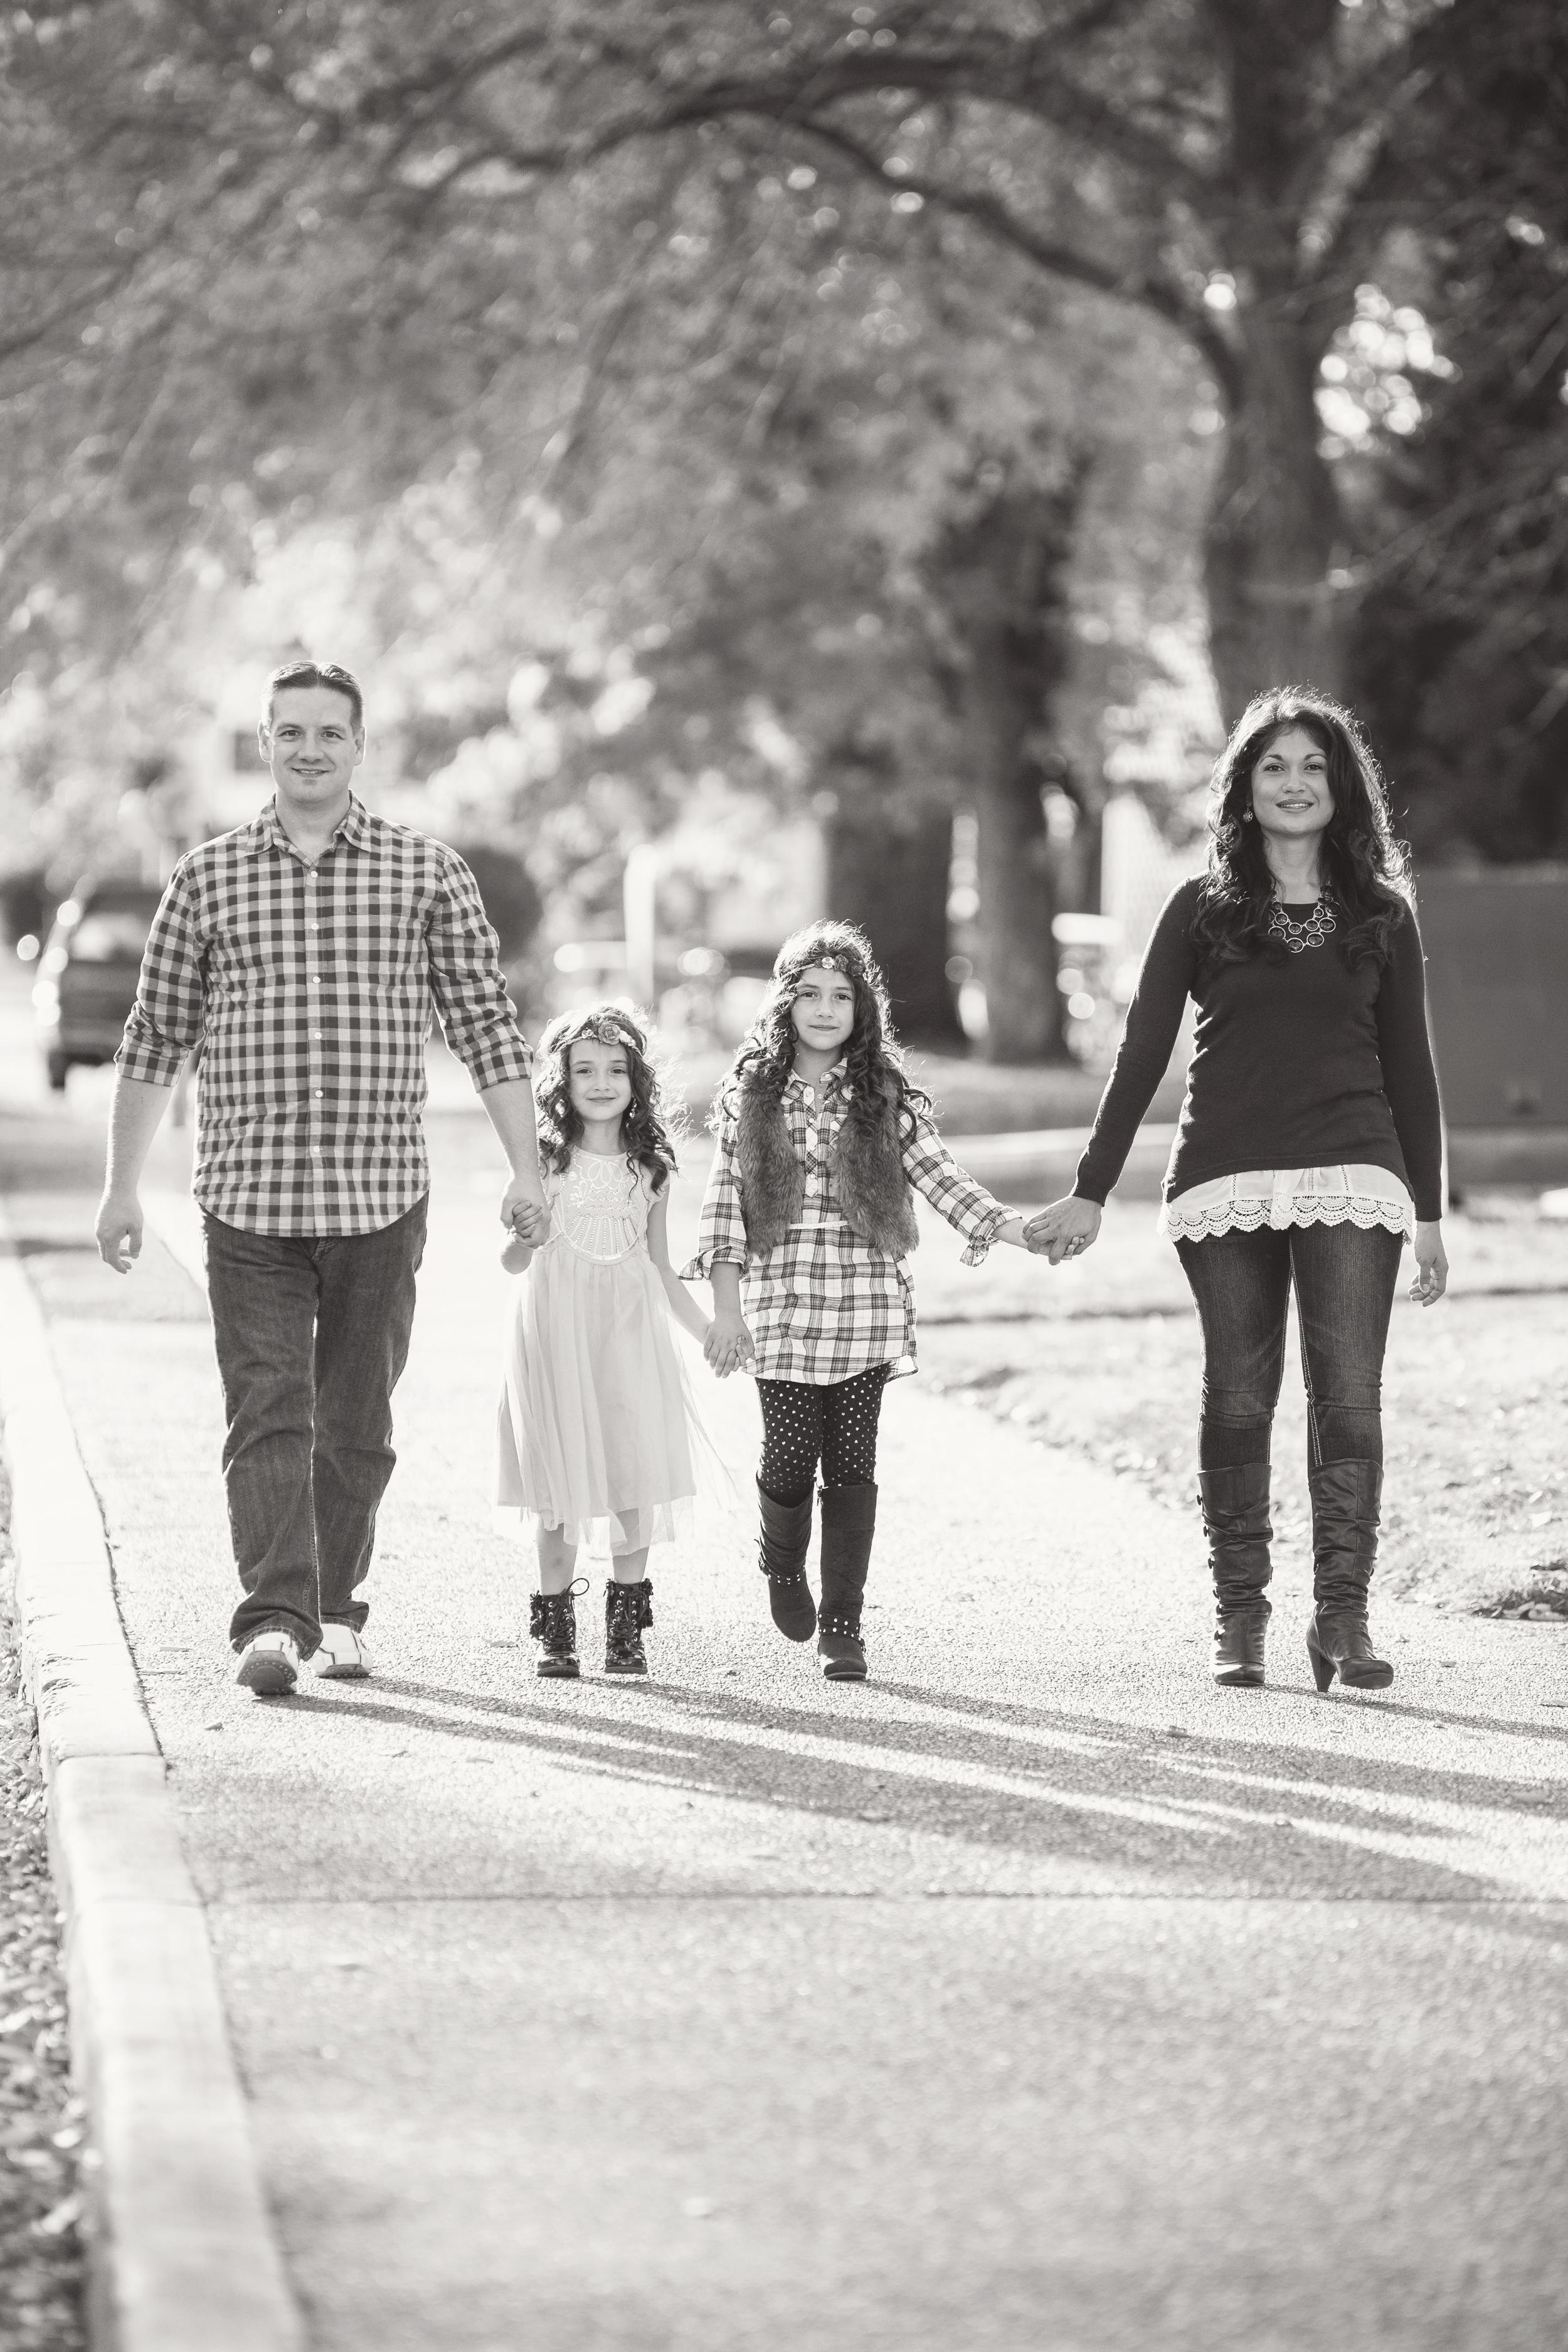 Family_Photos_2014_043_bw.jpg